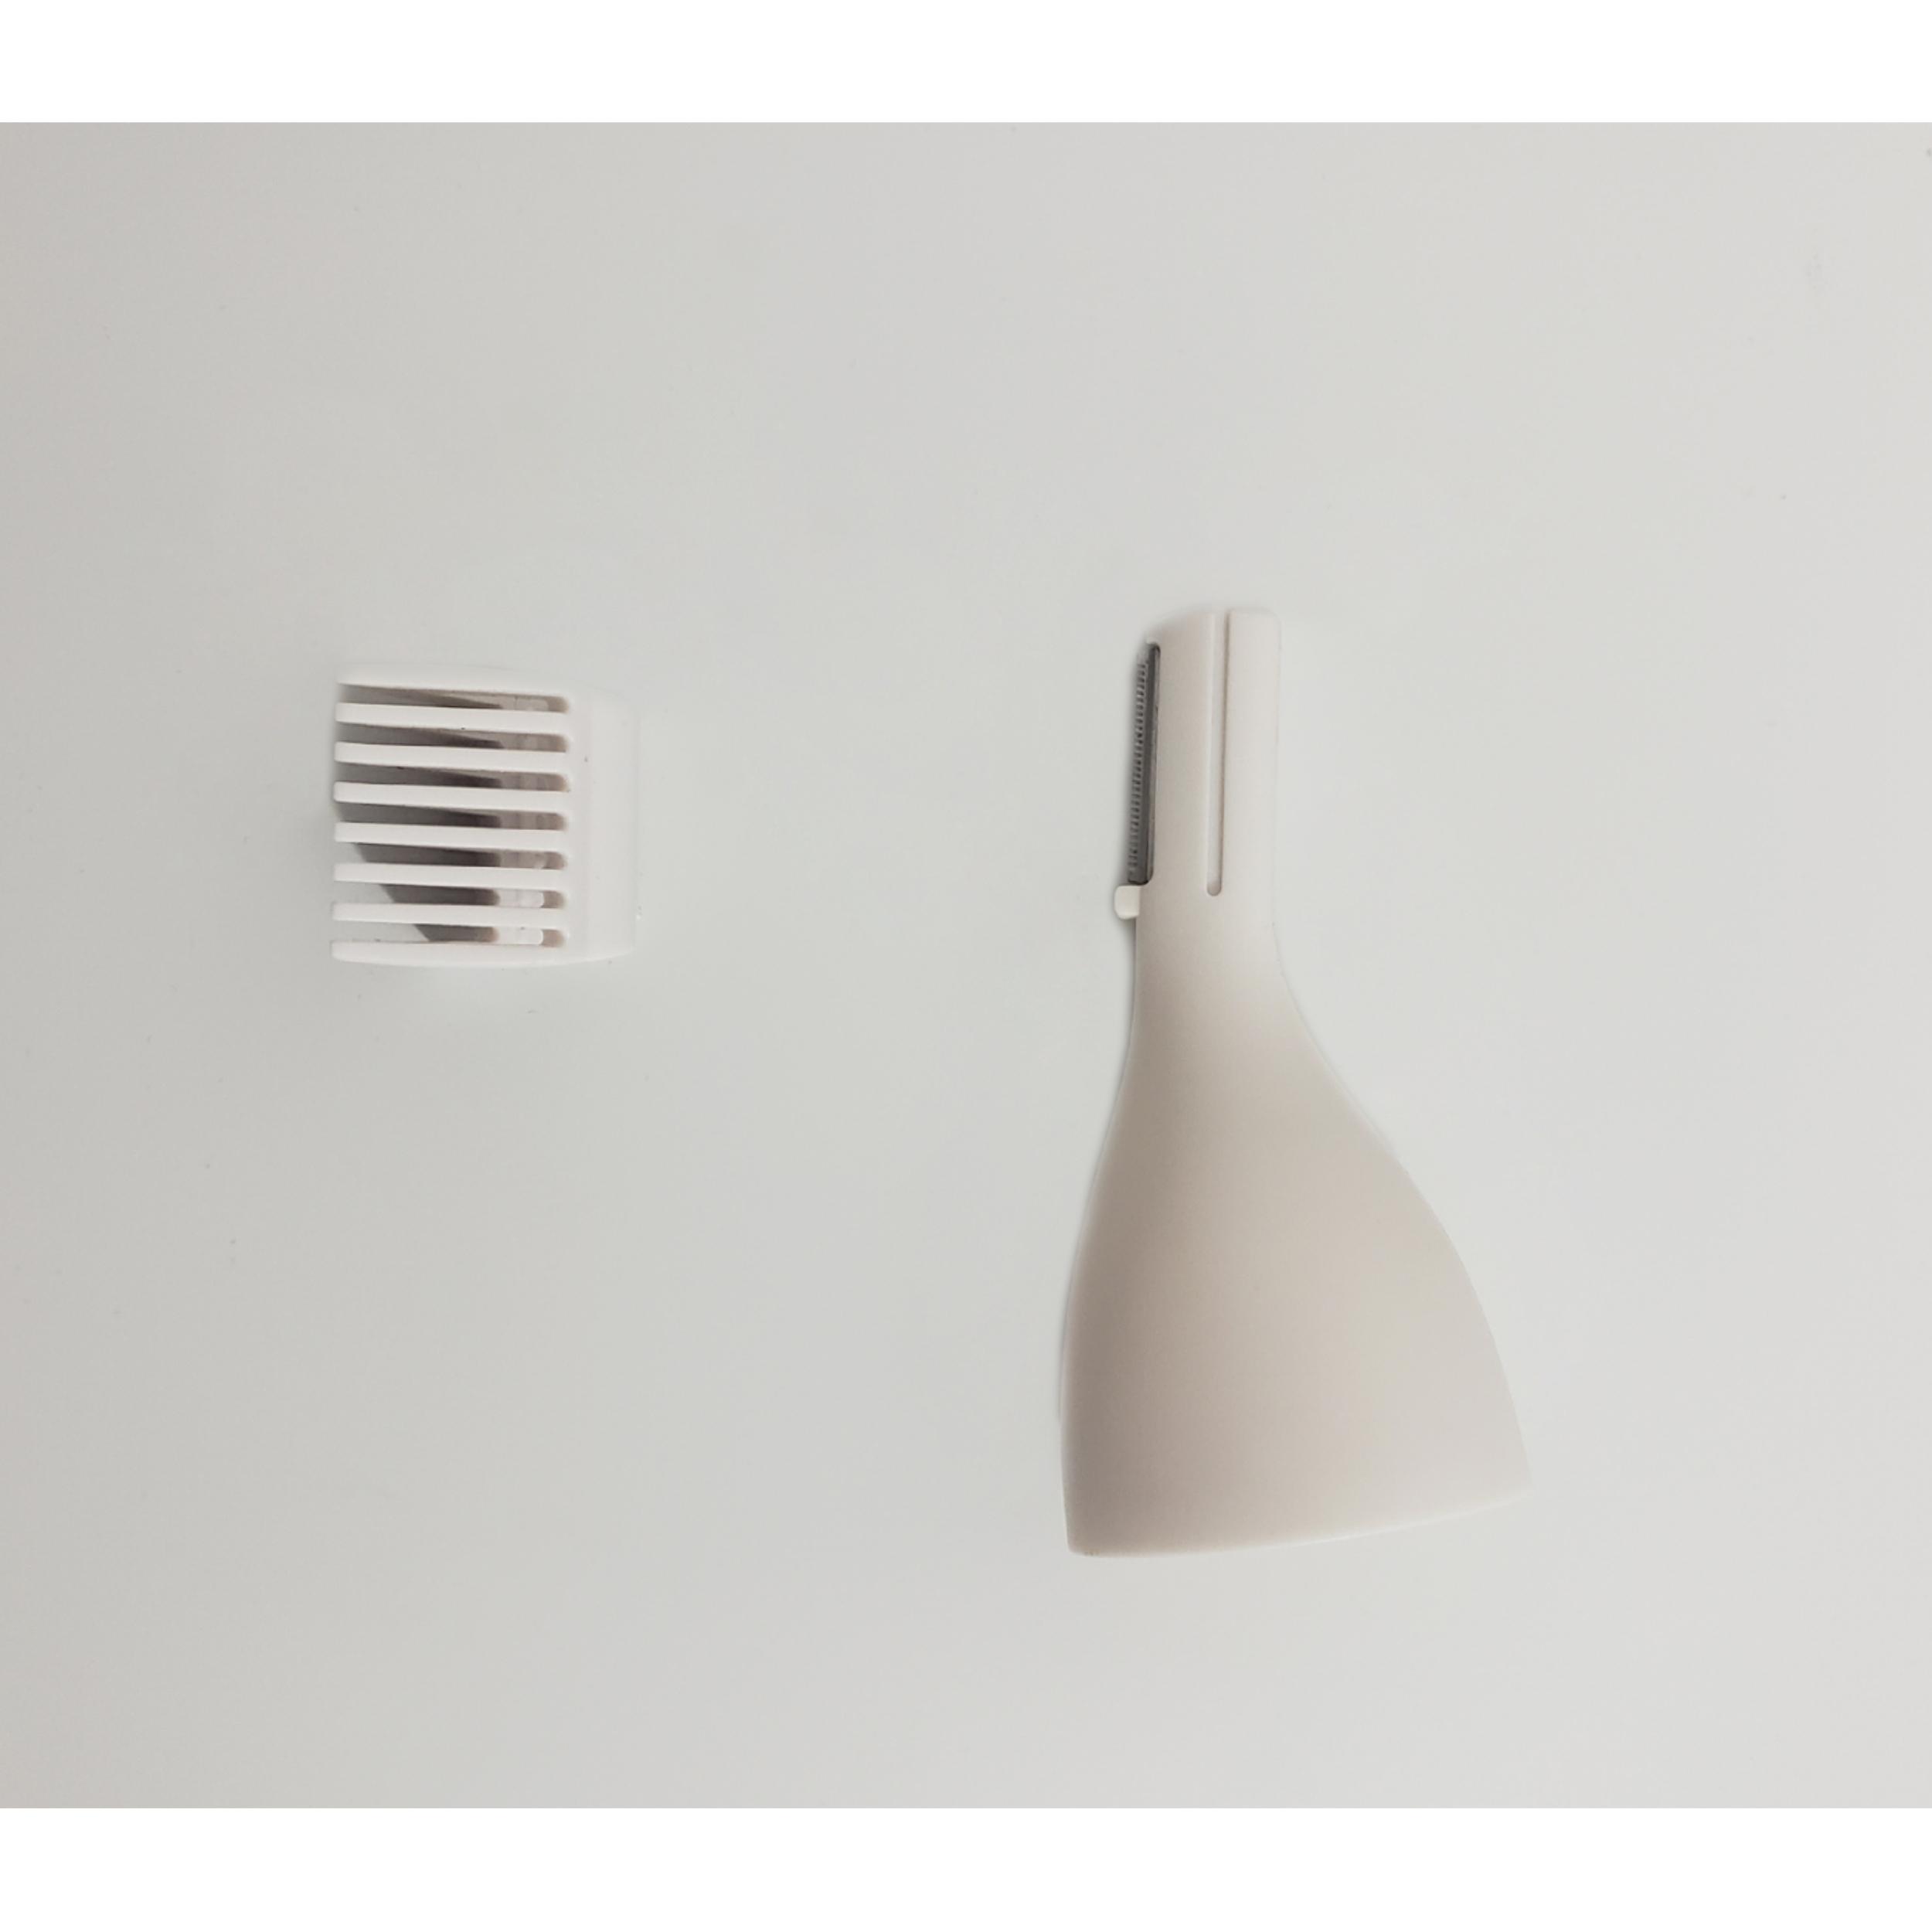 موزن گوش، بینی و ابرو پروجیمی مدل Gm-3078 main 1 9